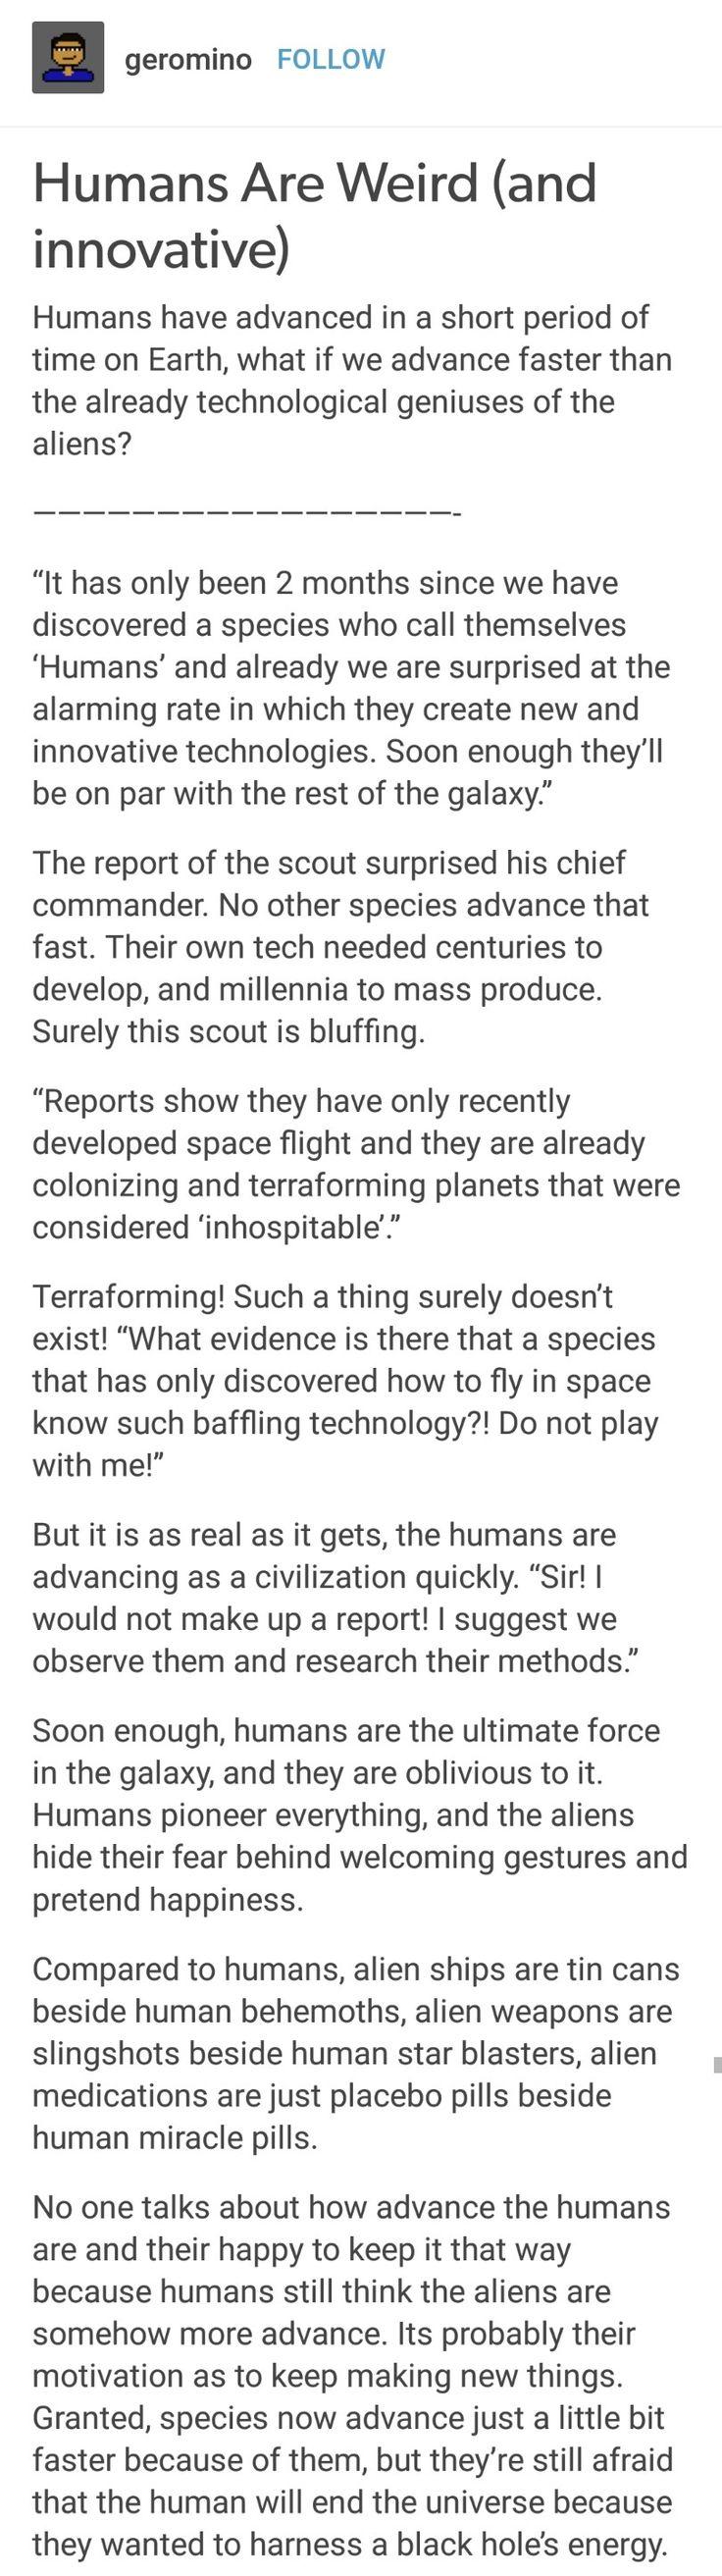 Humans are Weird: Innovative